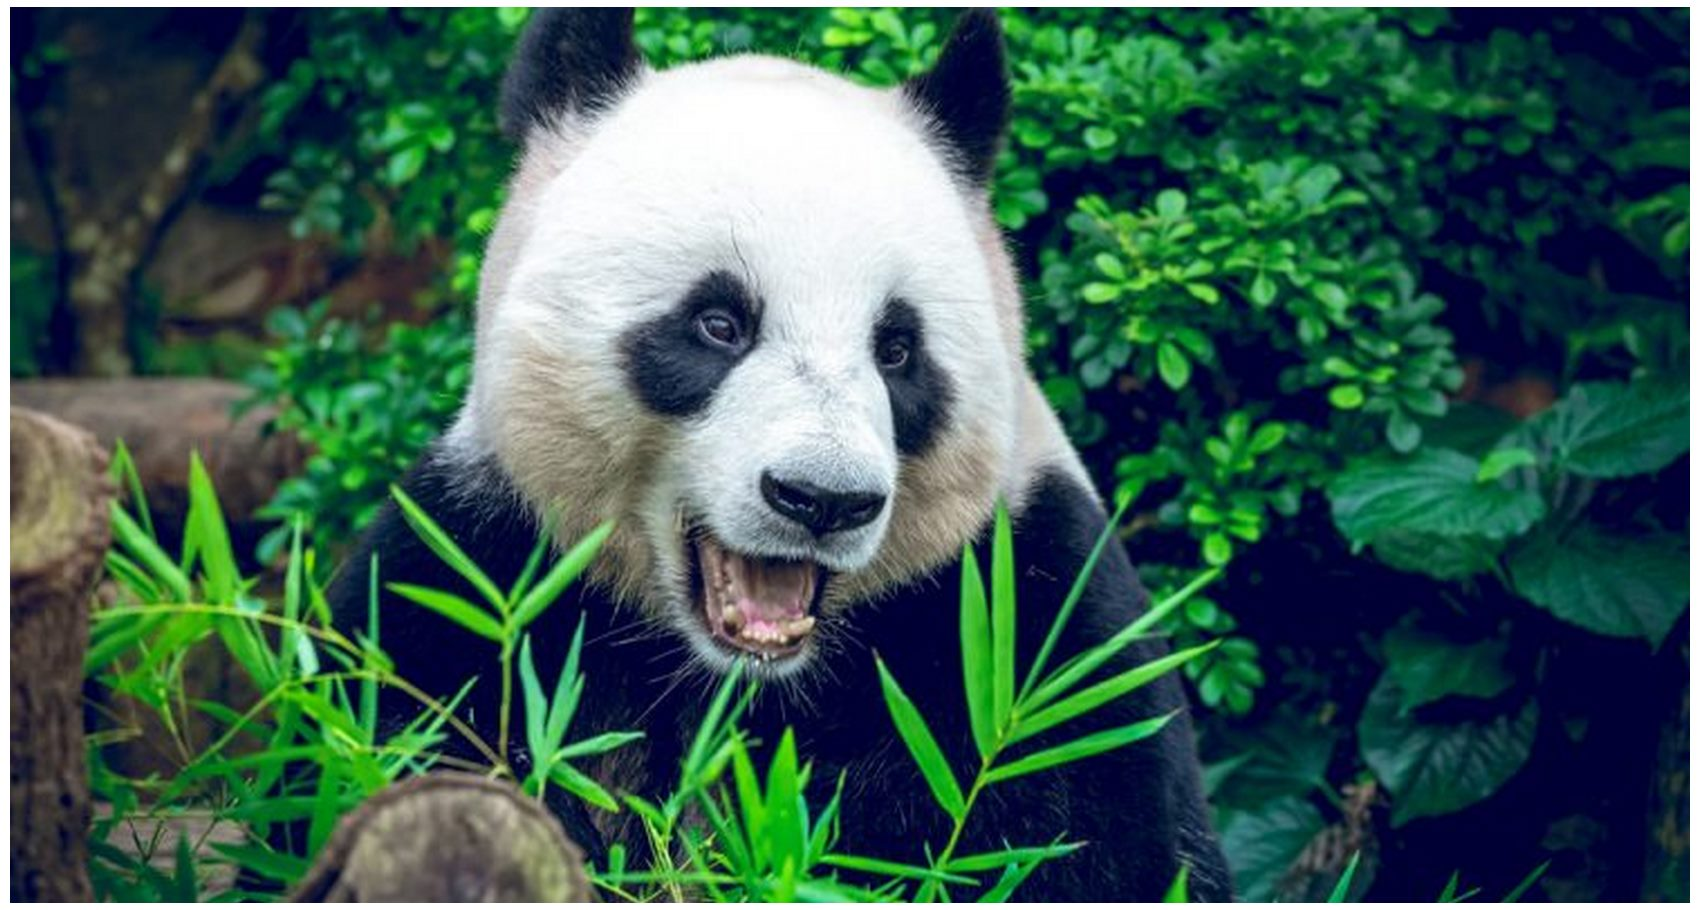 New panda information in Green Jungle